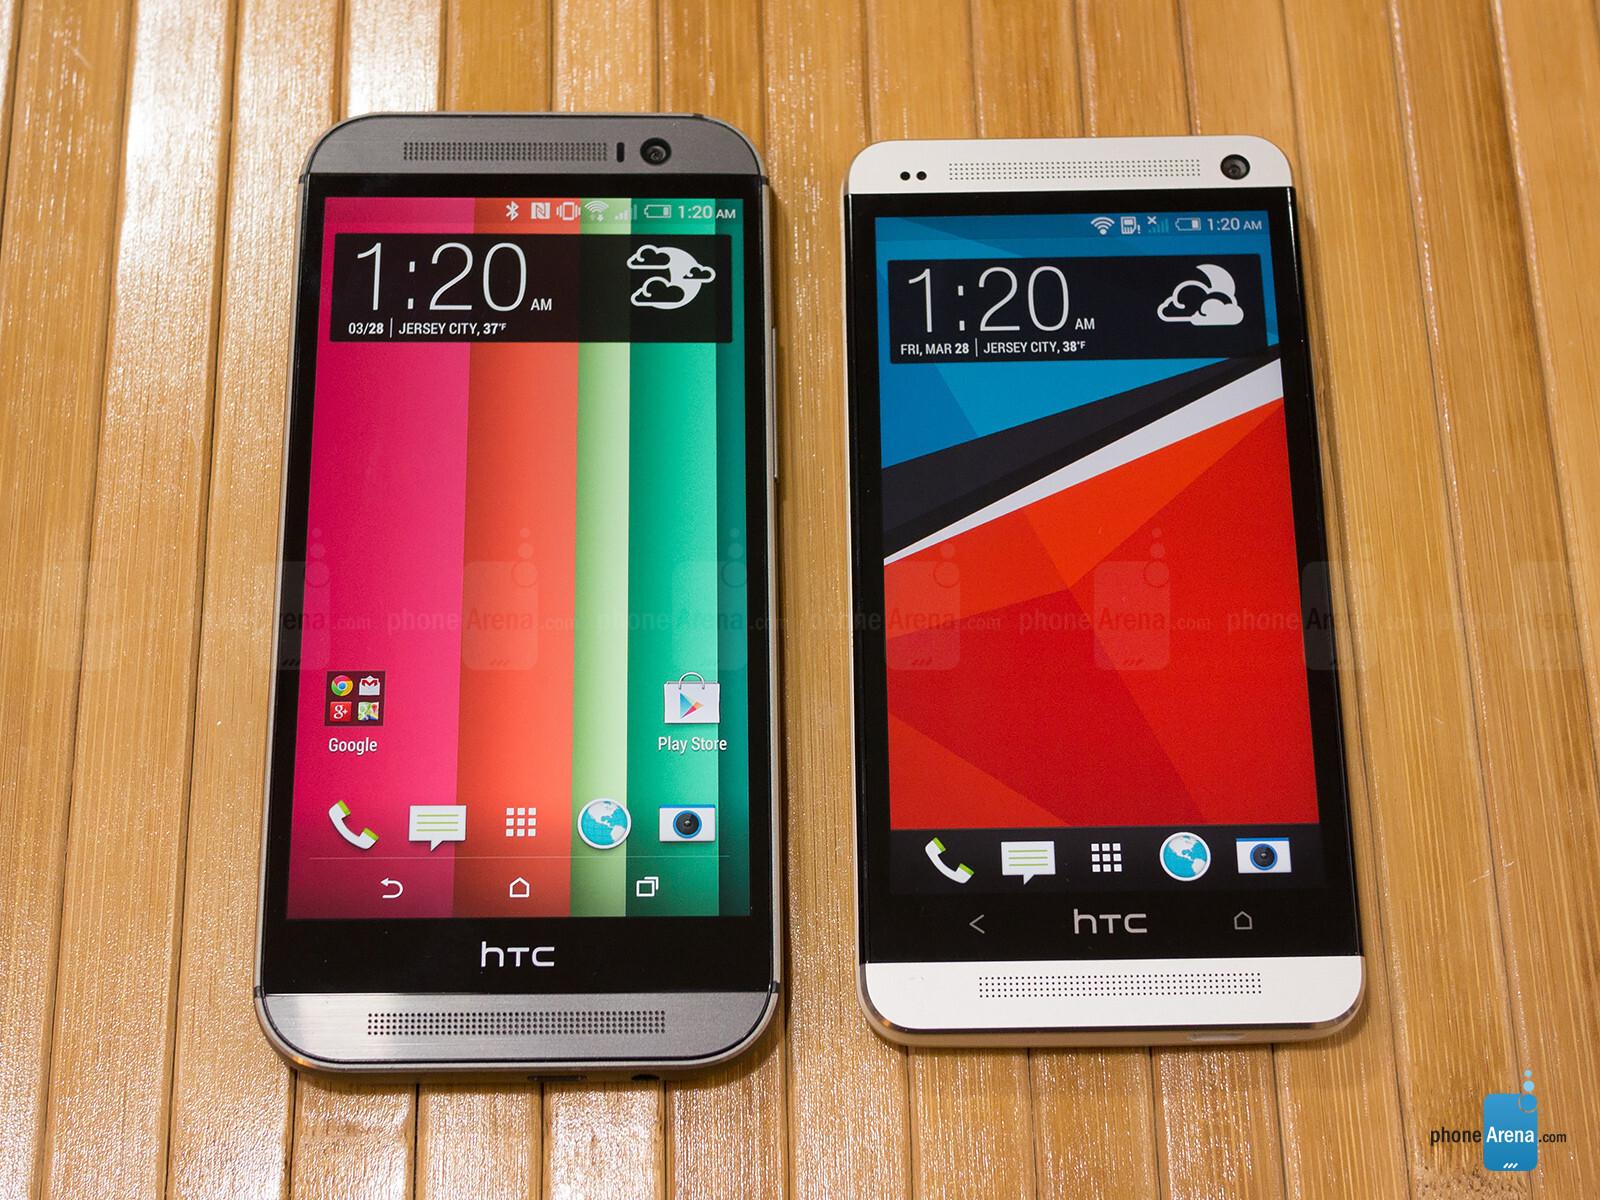 Htc One M7 Vs Htc One